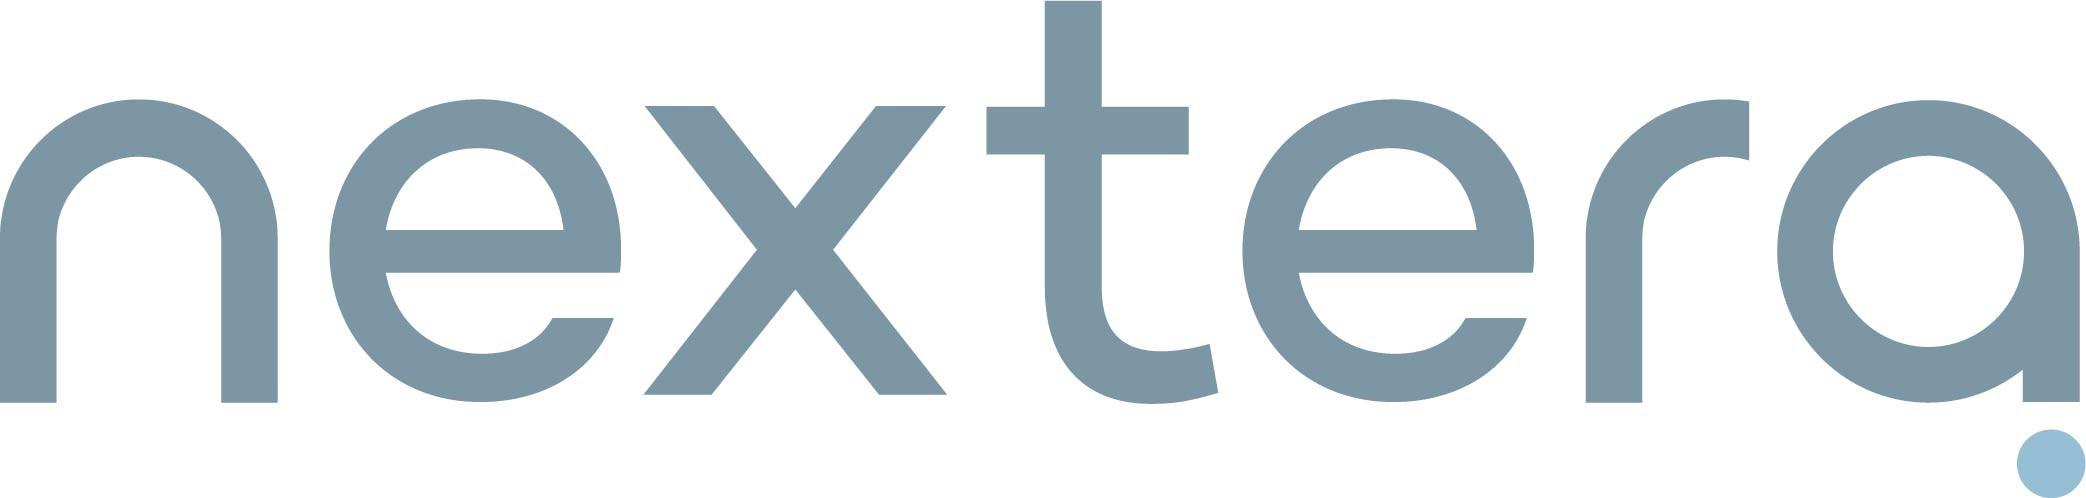 Nextera_logo